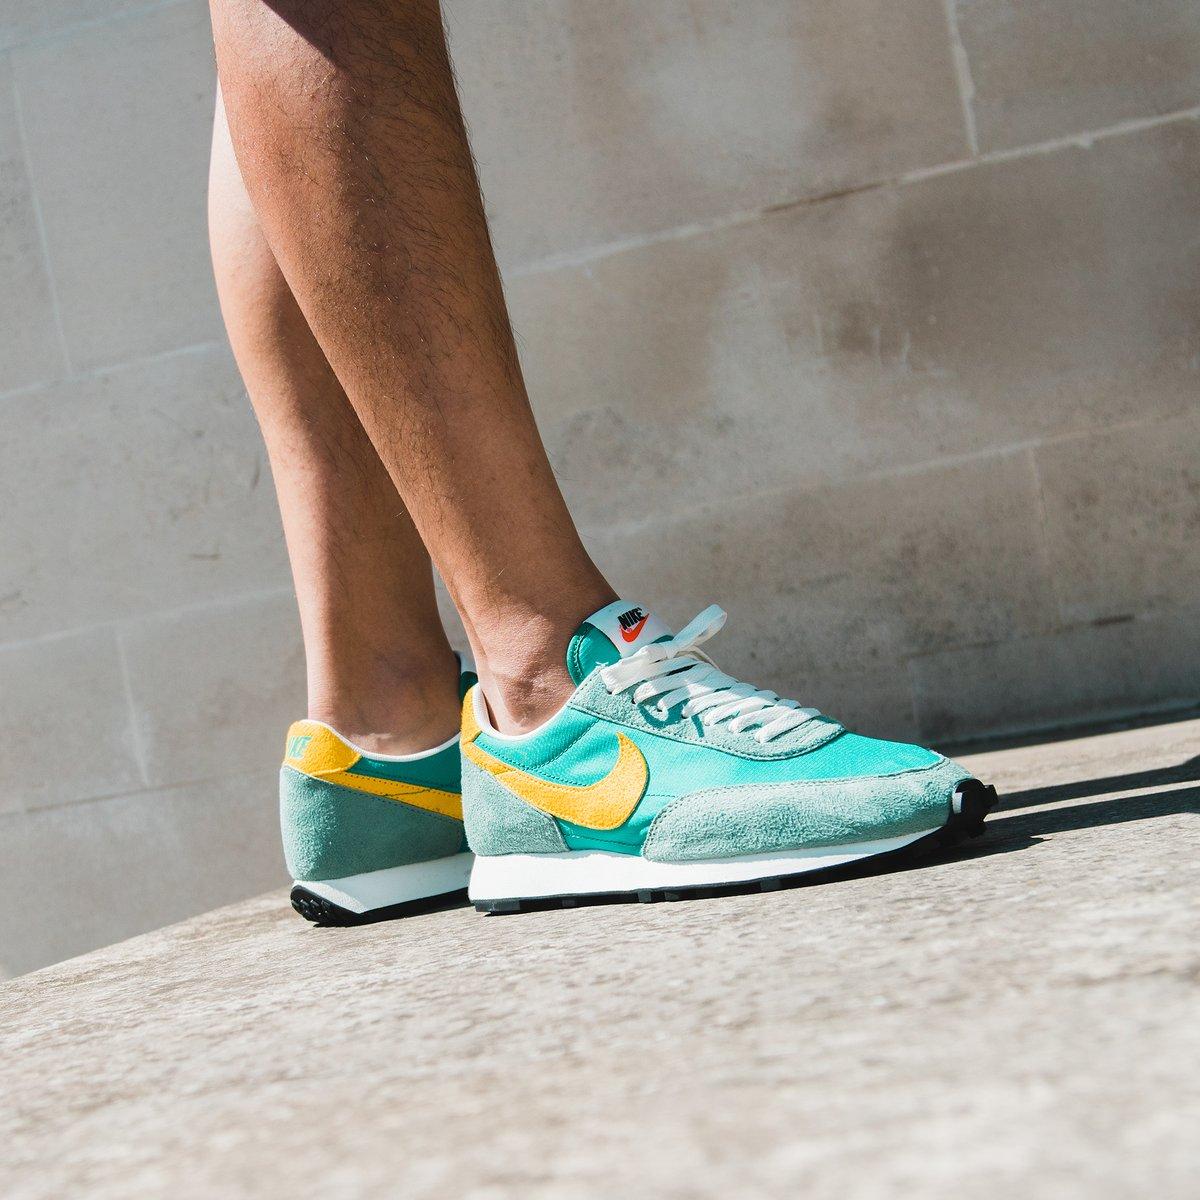 Nike Daybreak SP 'Neptune Green